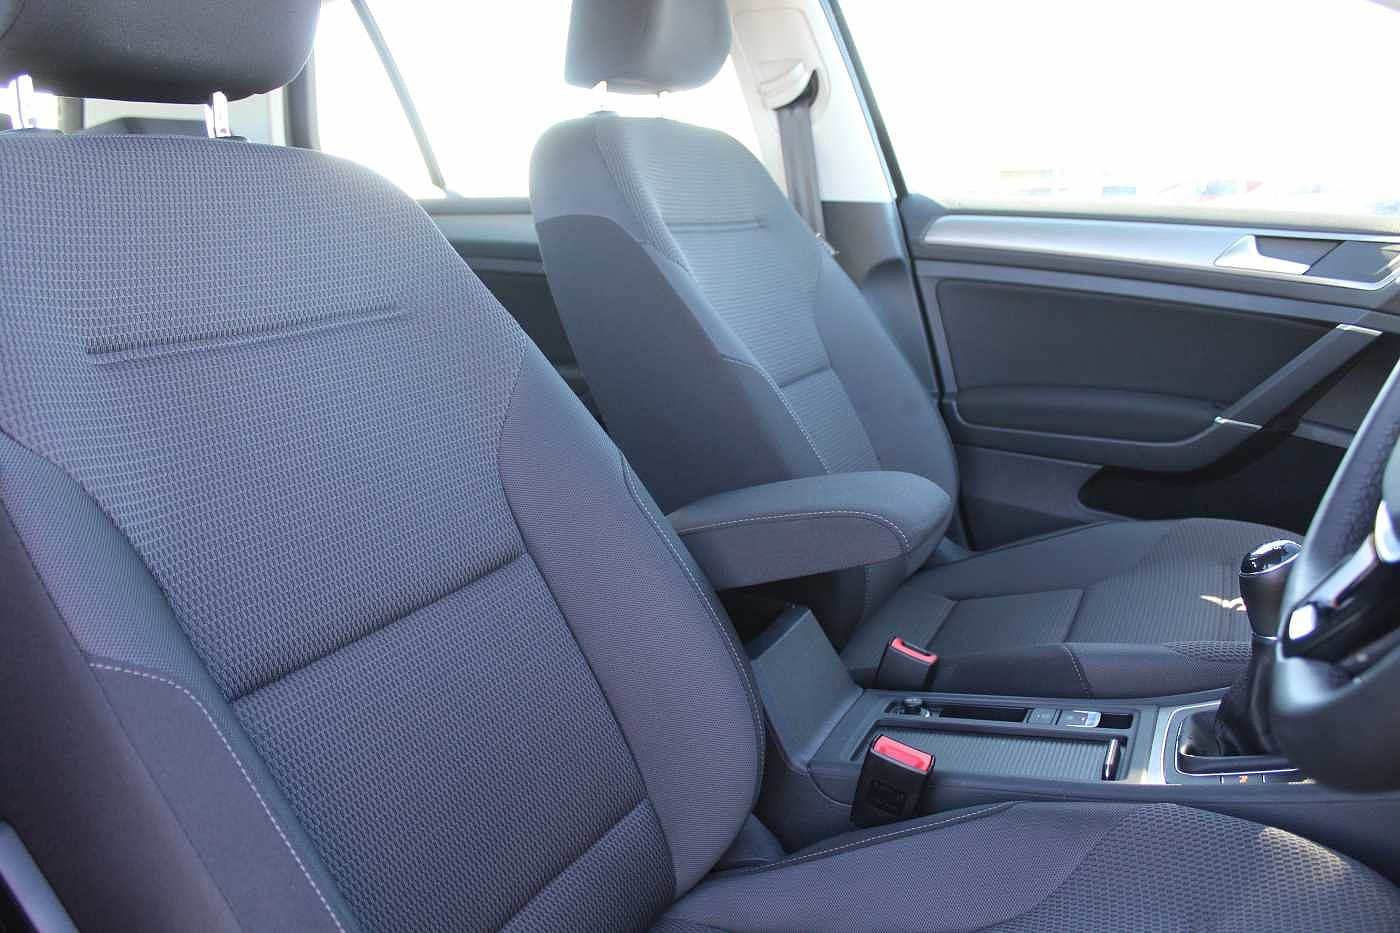 Volkswagen Golf 1.6 TDI Match Edition 110PS 5Dr